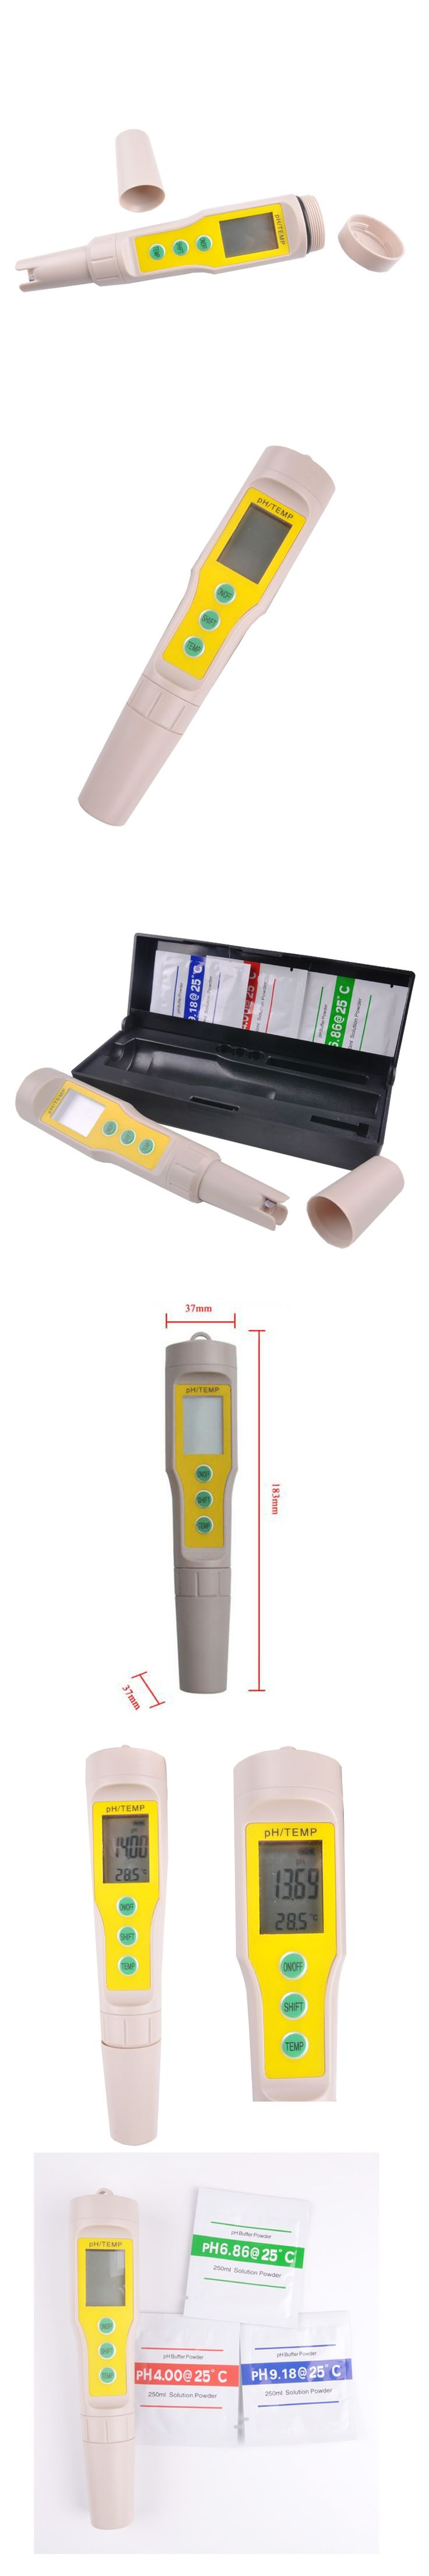 Electronic digital display double pH meter, water pH meter, portable pH meter professional, free shipping